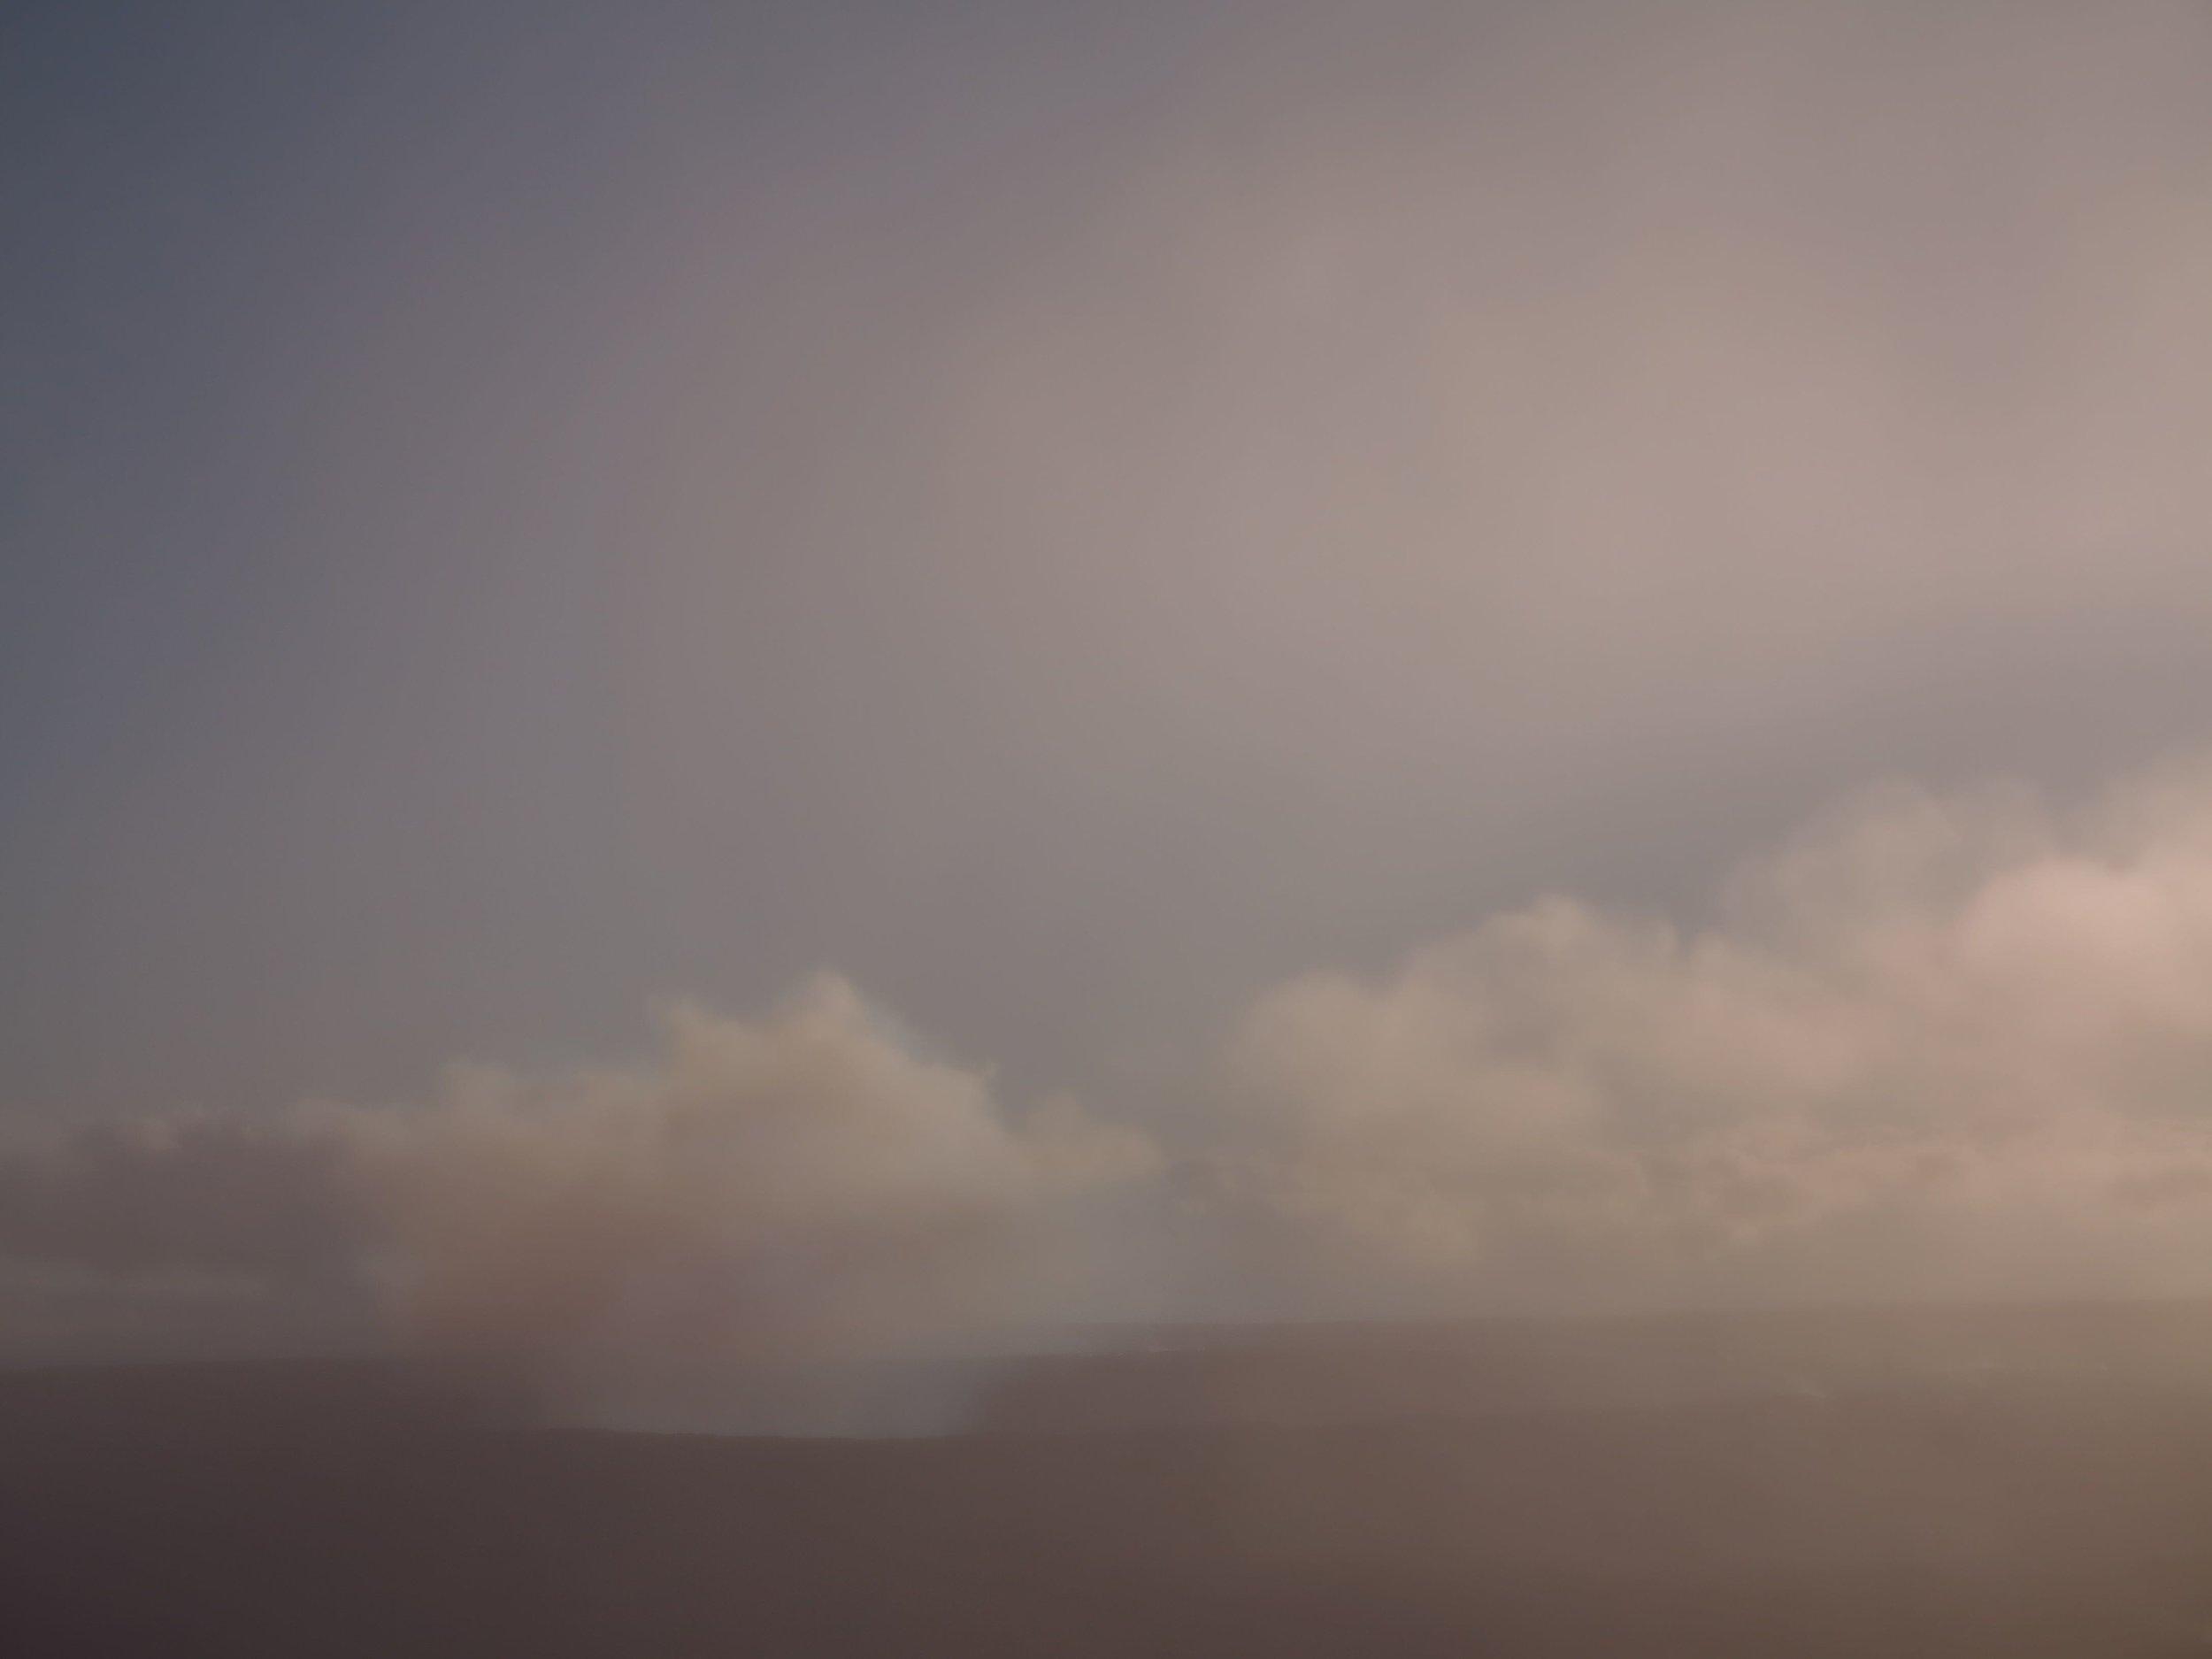 Halema'uma'u Crater, Hawaii Volcanoes National Park